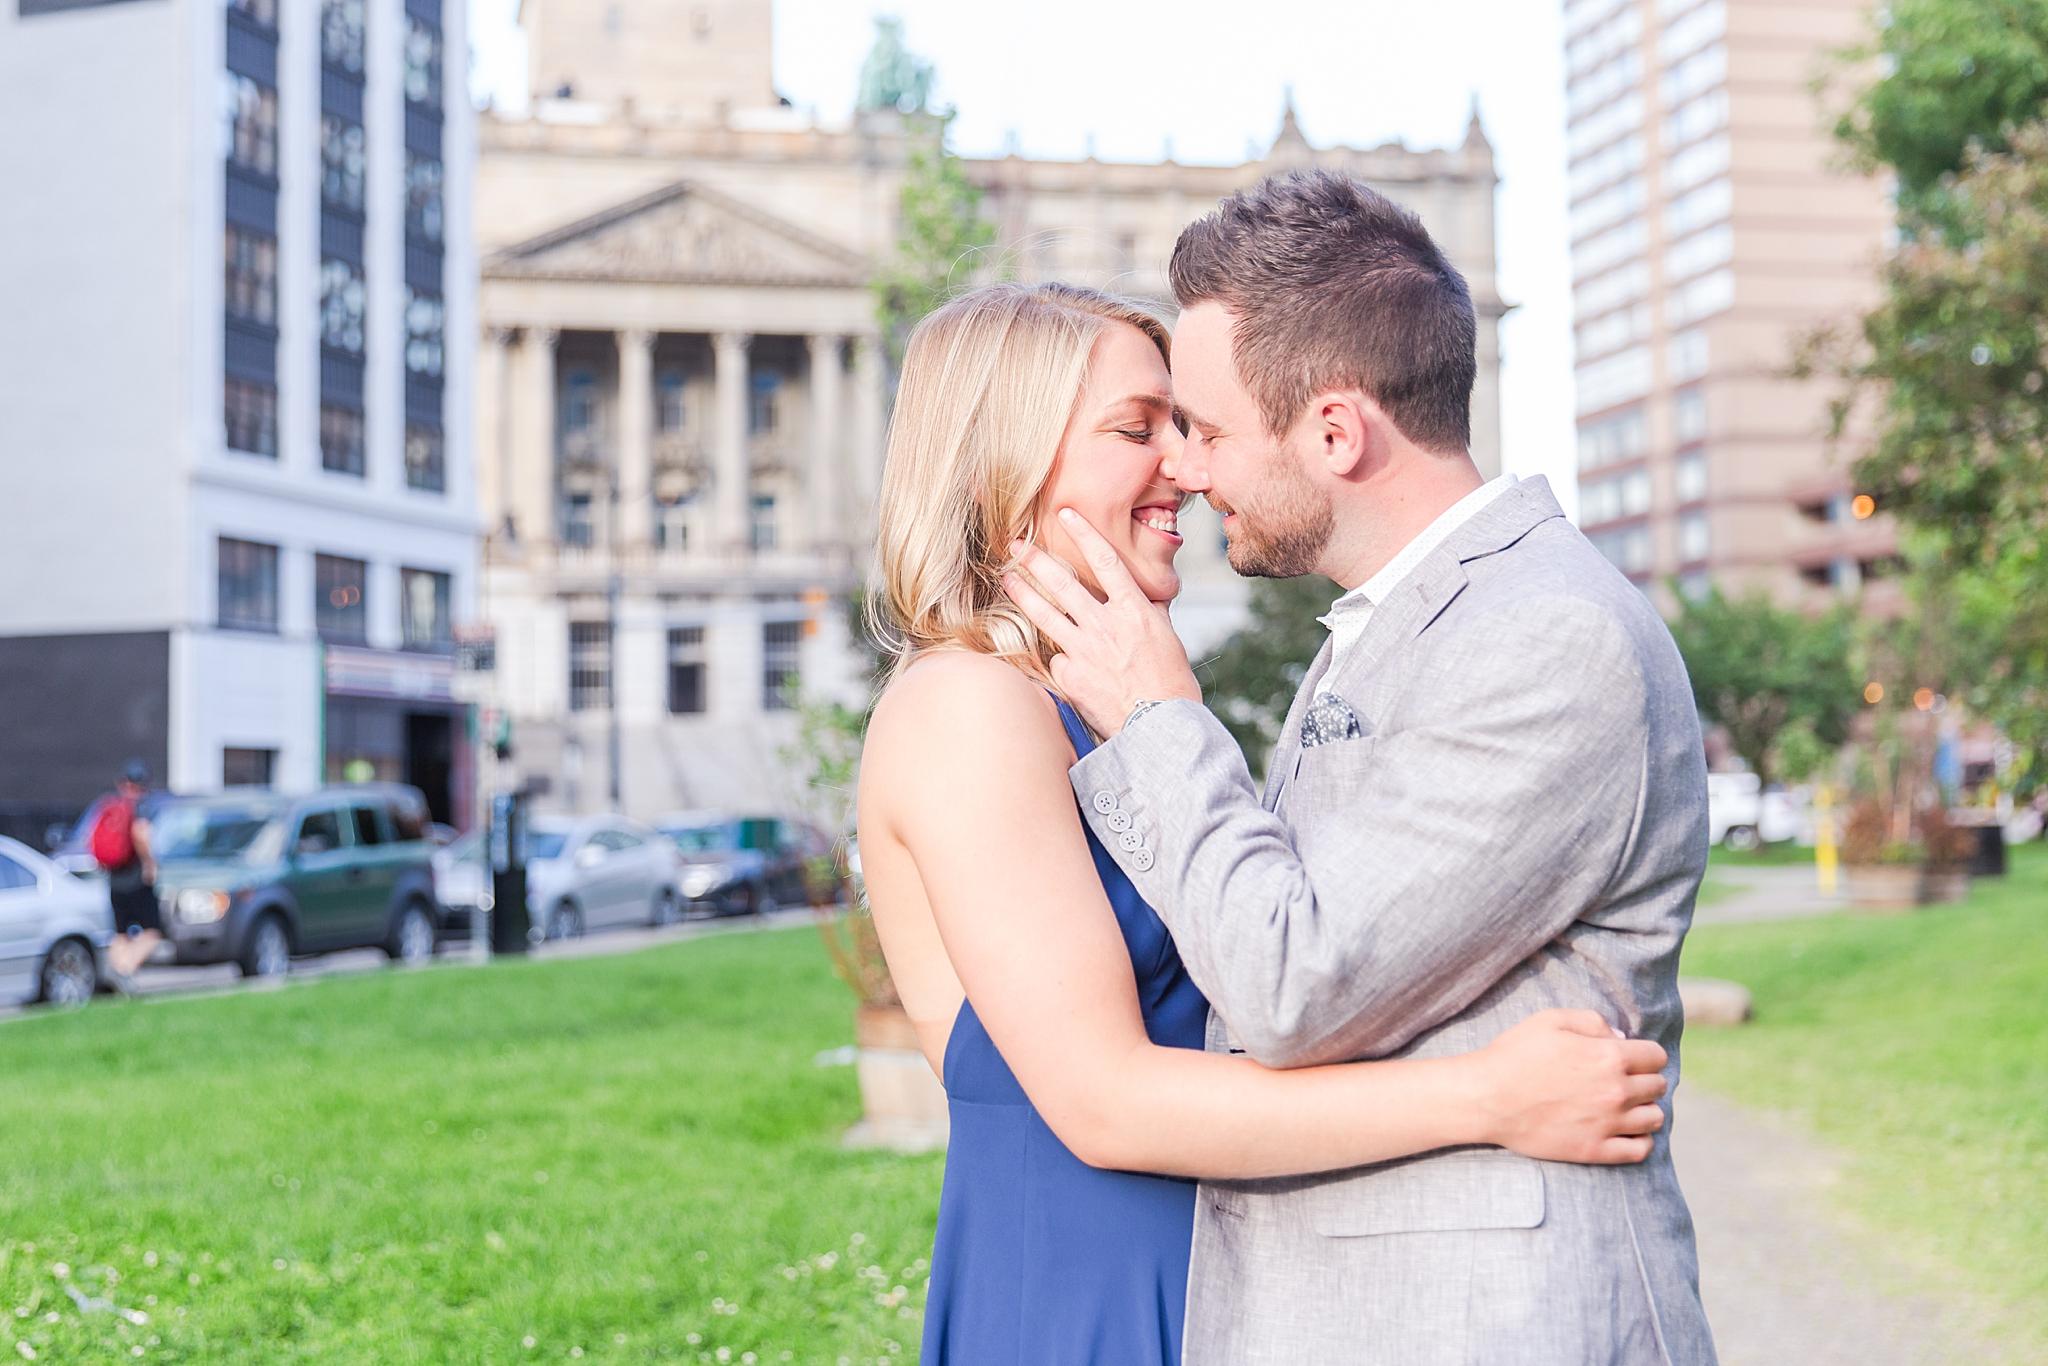 detroit-wedding-photographer-downtown-detroit-belle-isle-engagement-photos-sarah-eric-by-courtney-carolyn-photography_0024.jpg